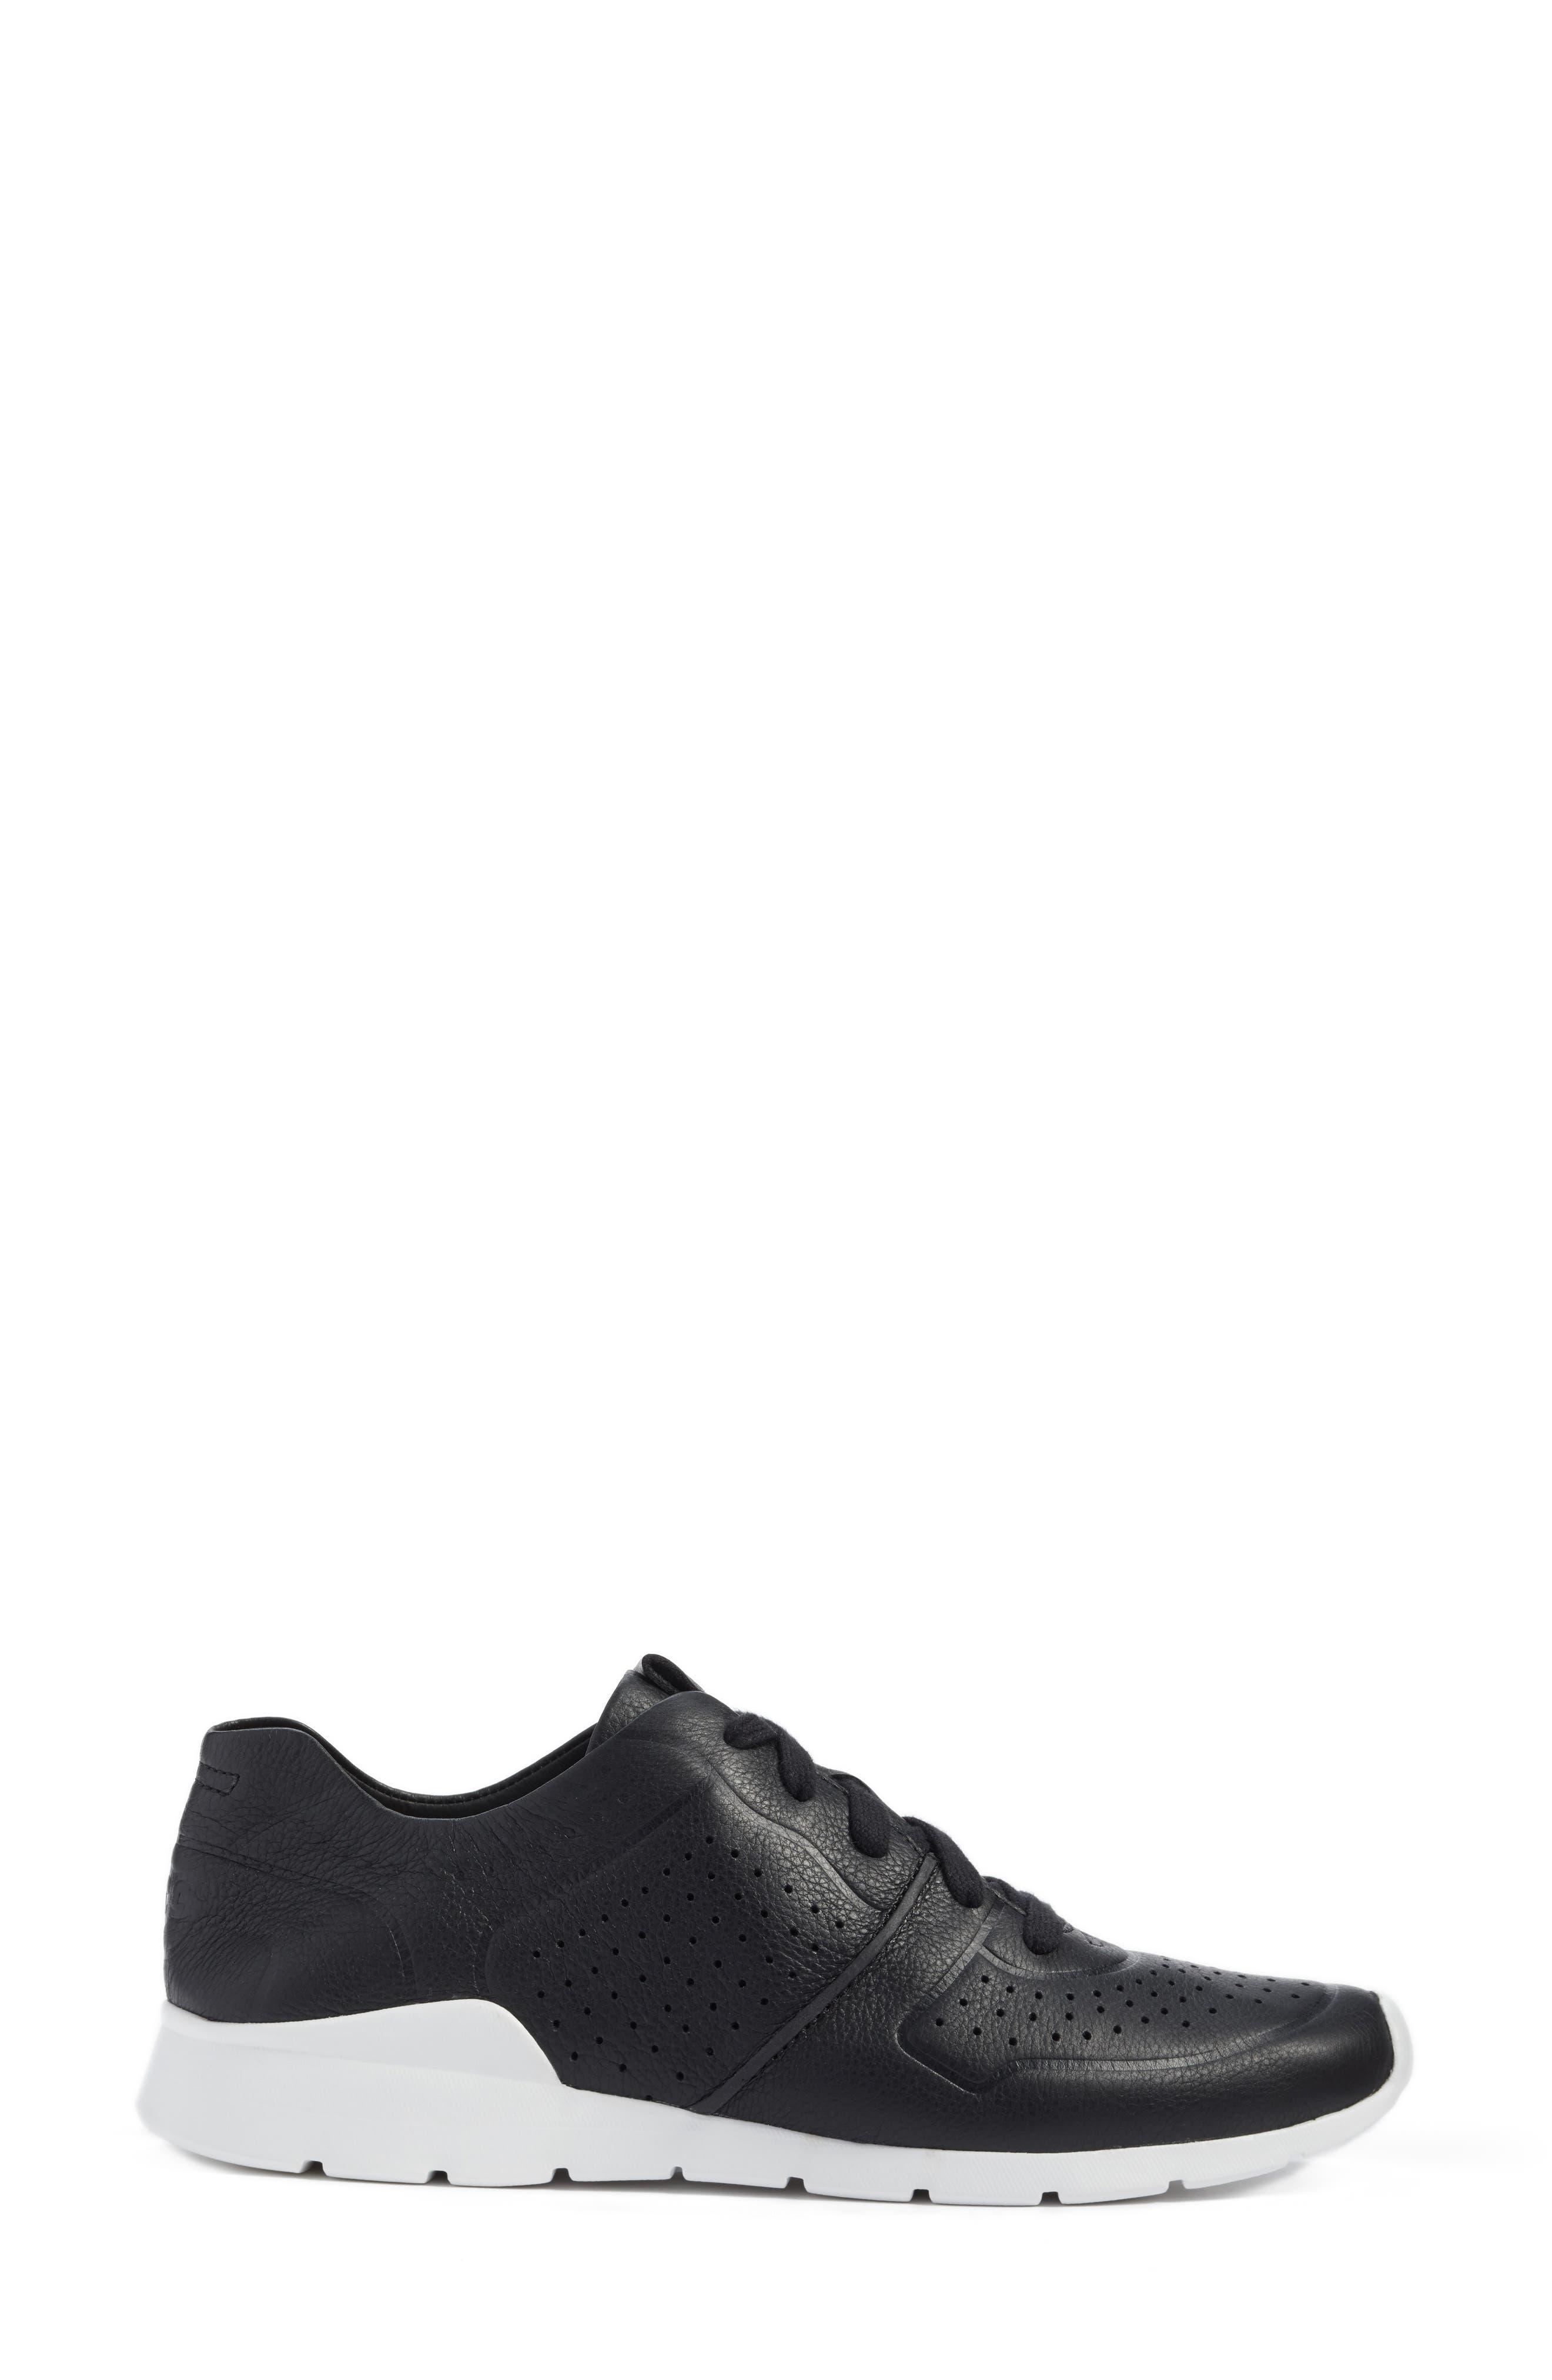 Tye Sneaker,                             Alternate thumbnail 3, color,                             001